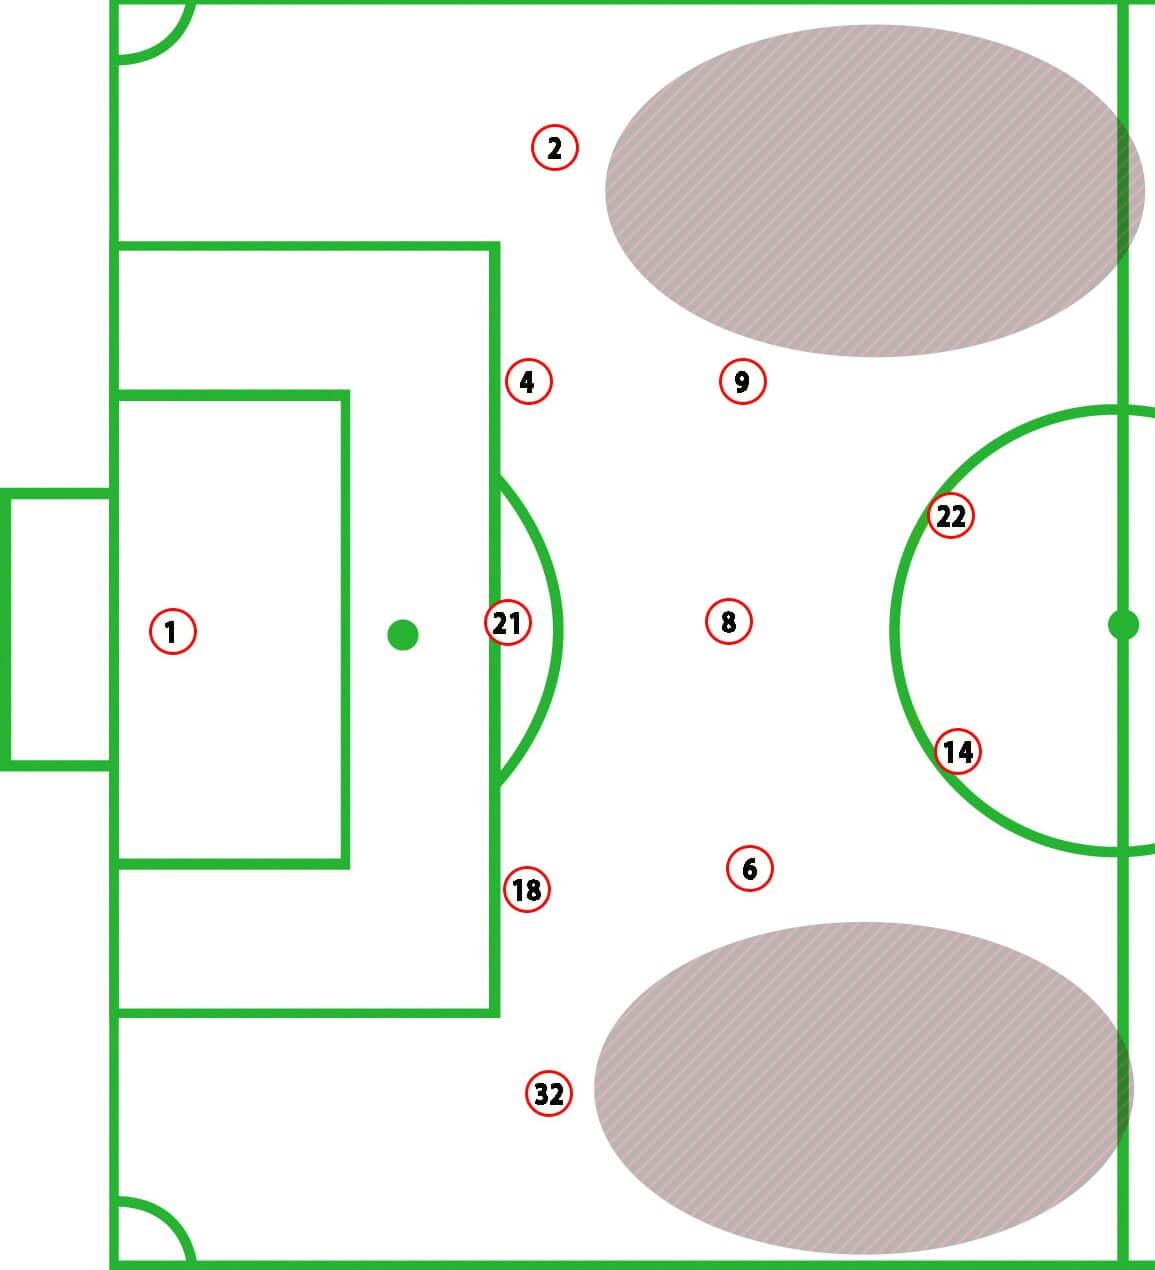 Borussia Dortmund vs VfB Stuttgart Bundesliga 2018/19 Tactical Analysis